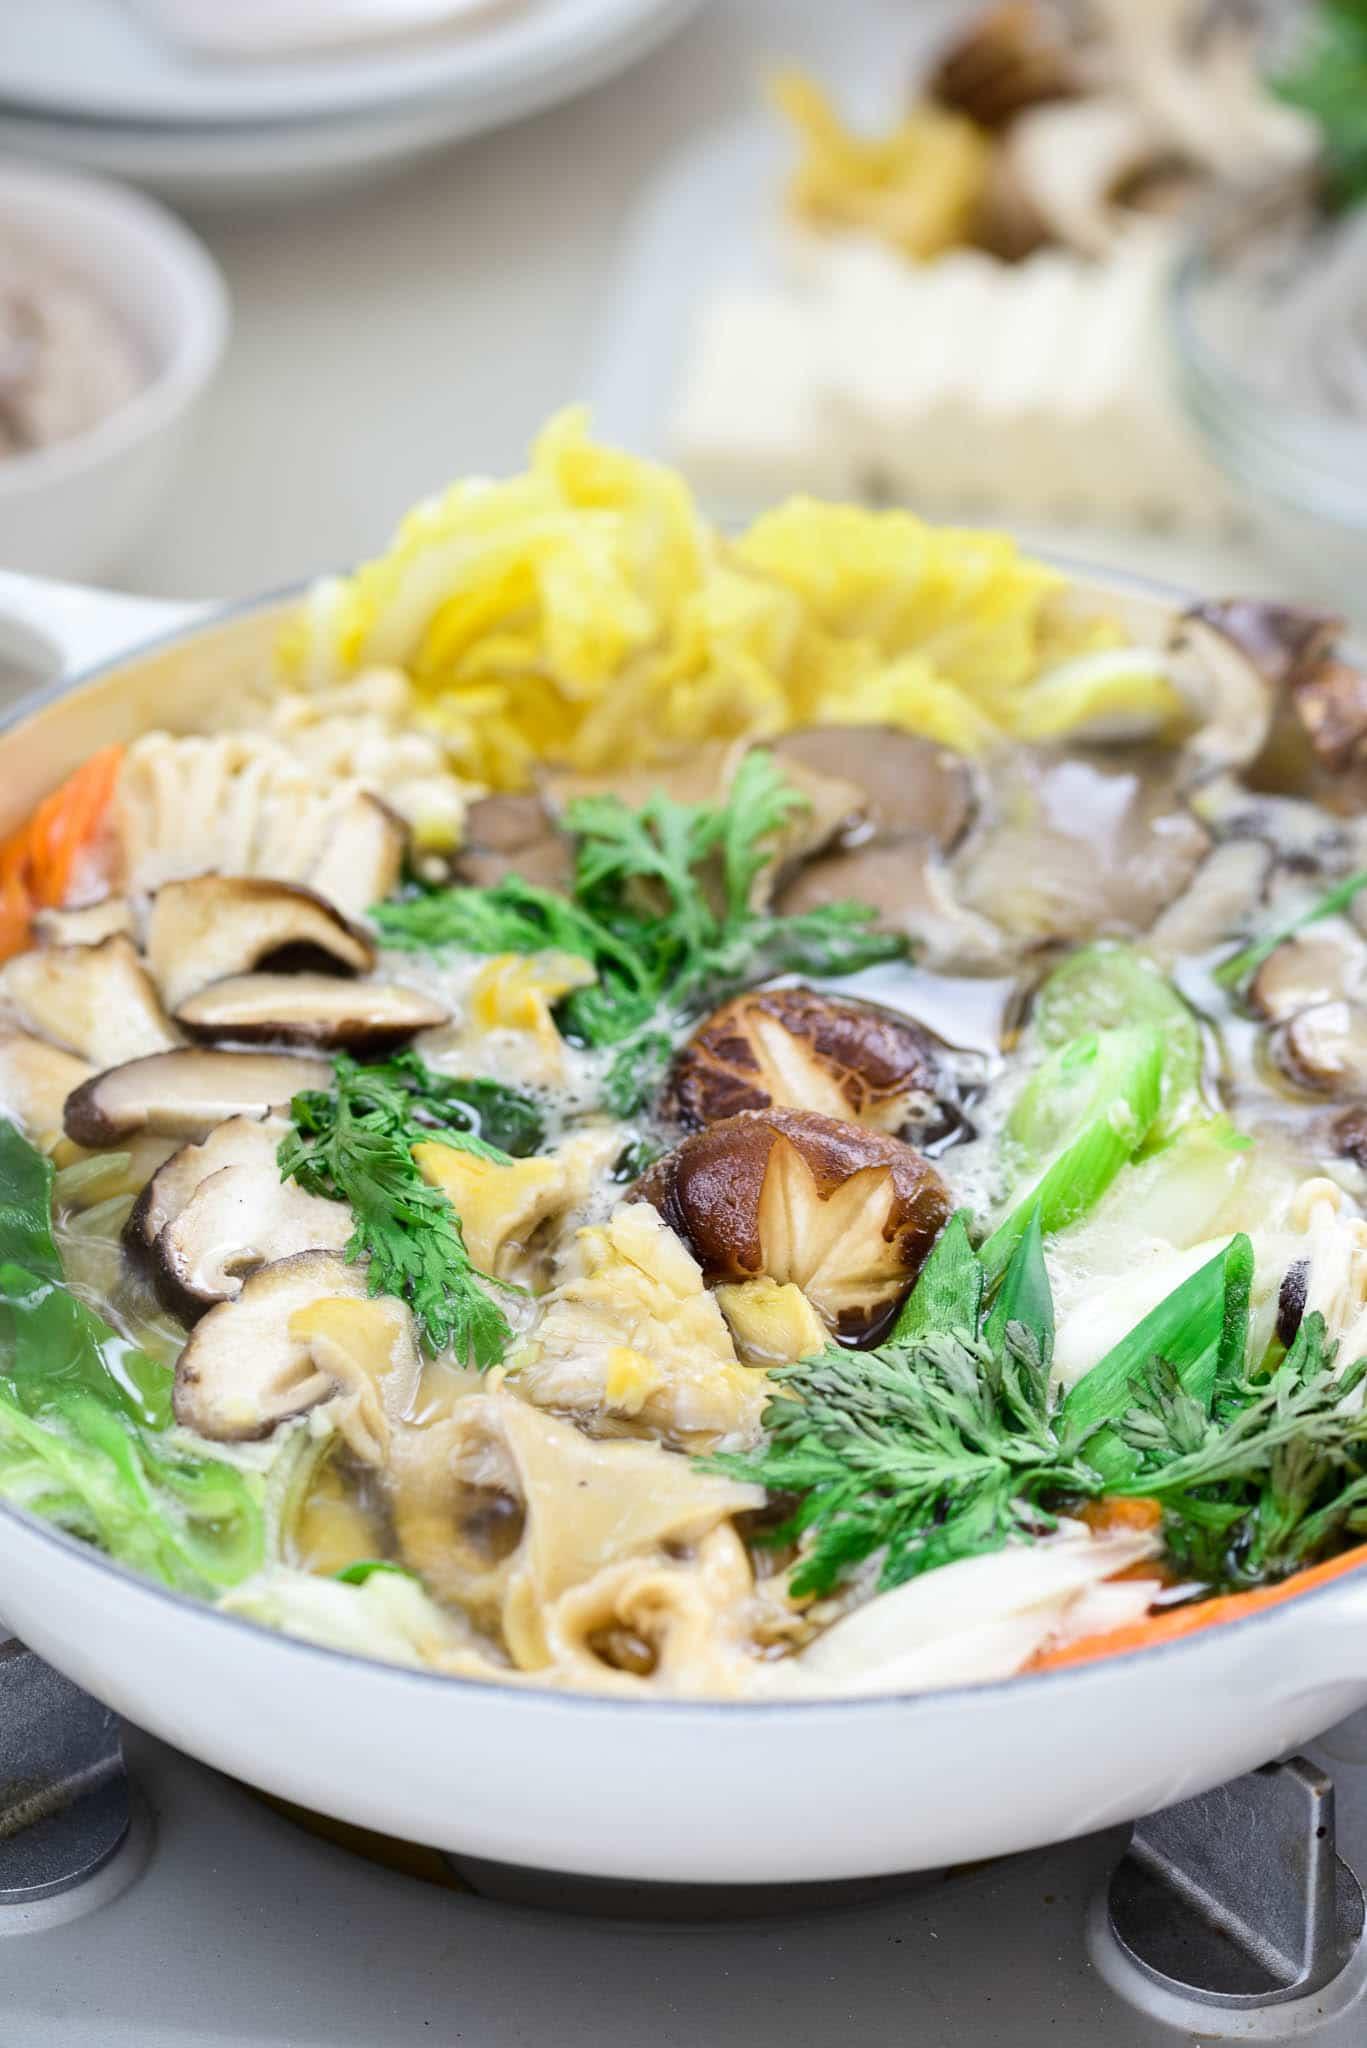 DSC7464 2 - A Korean Mom's Cooking